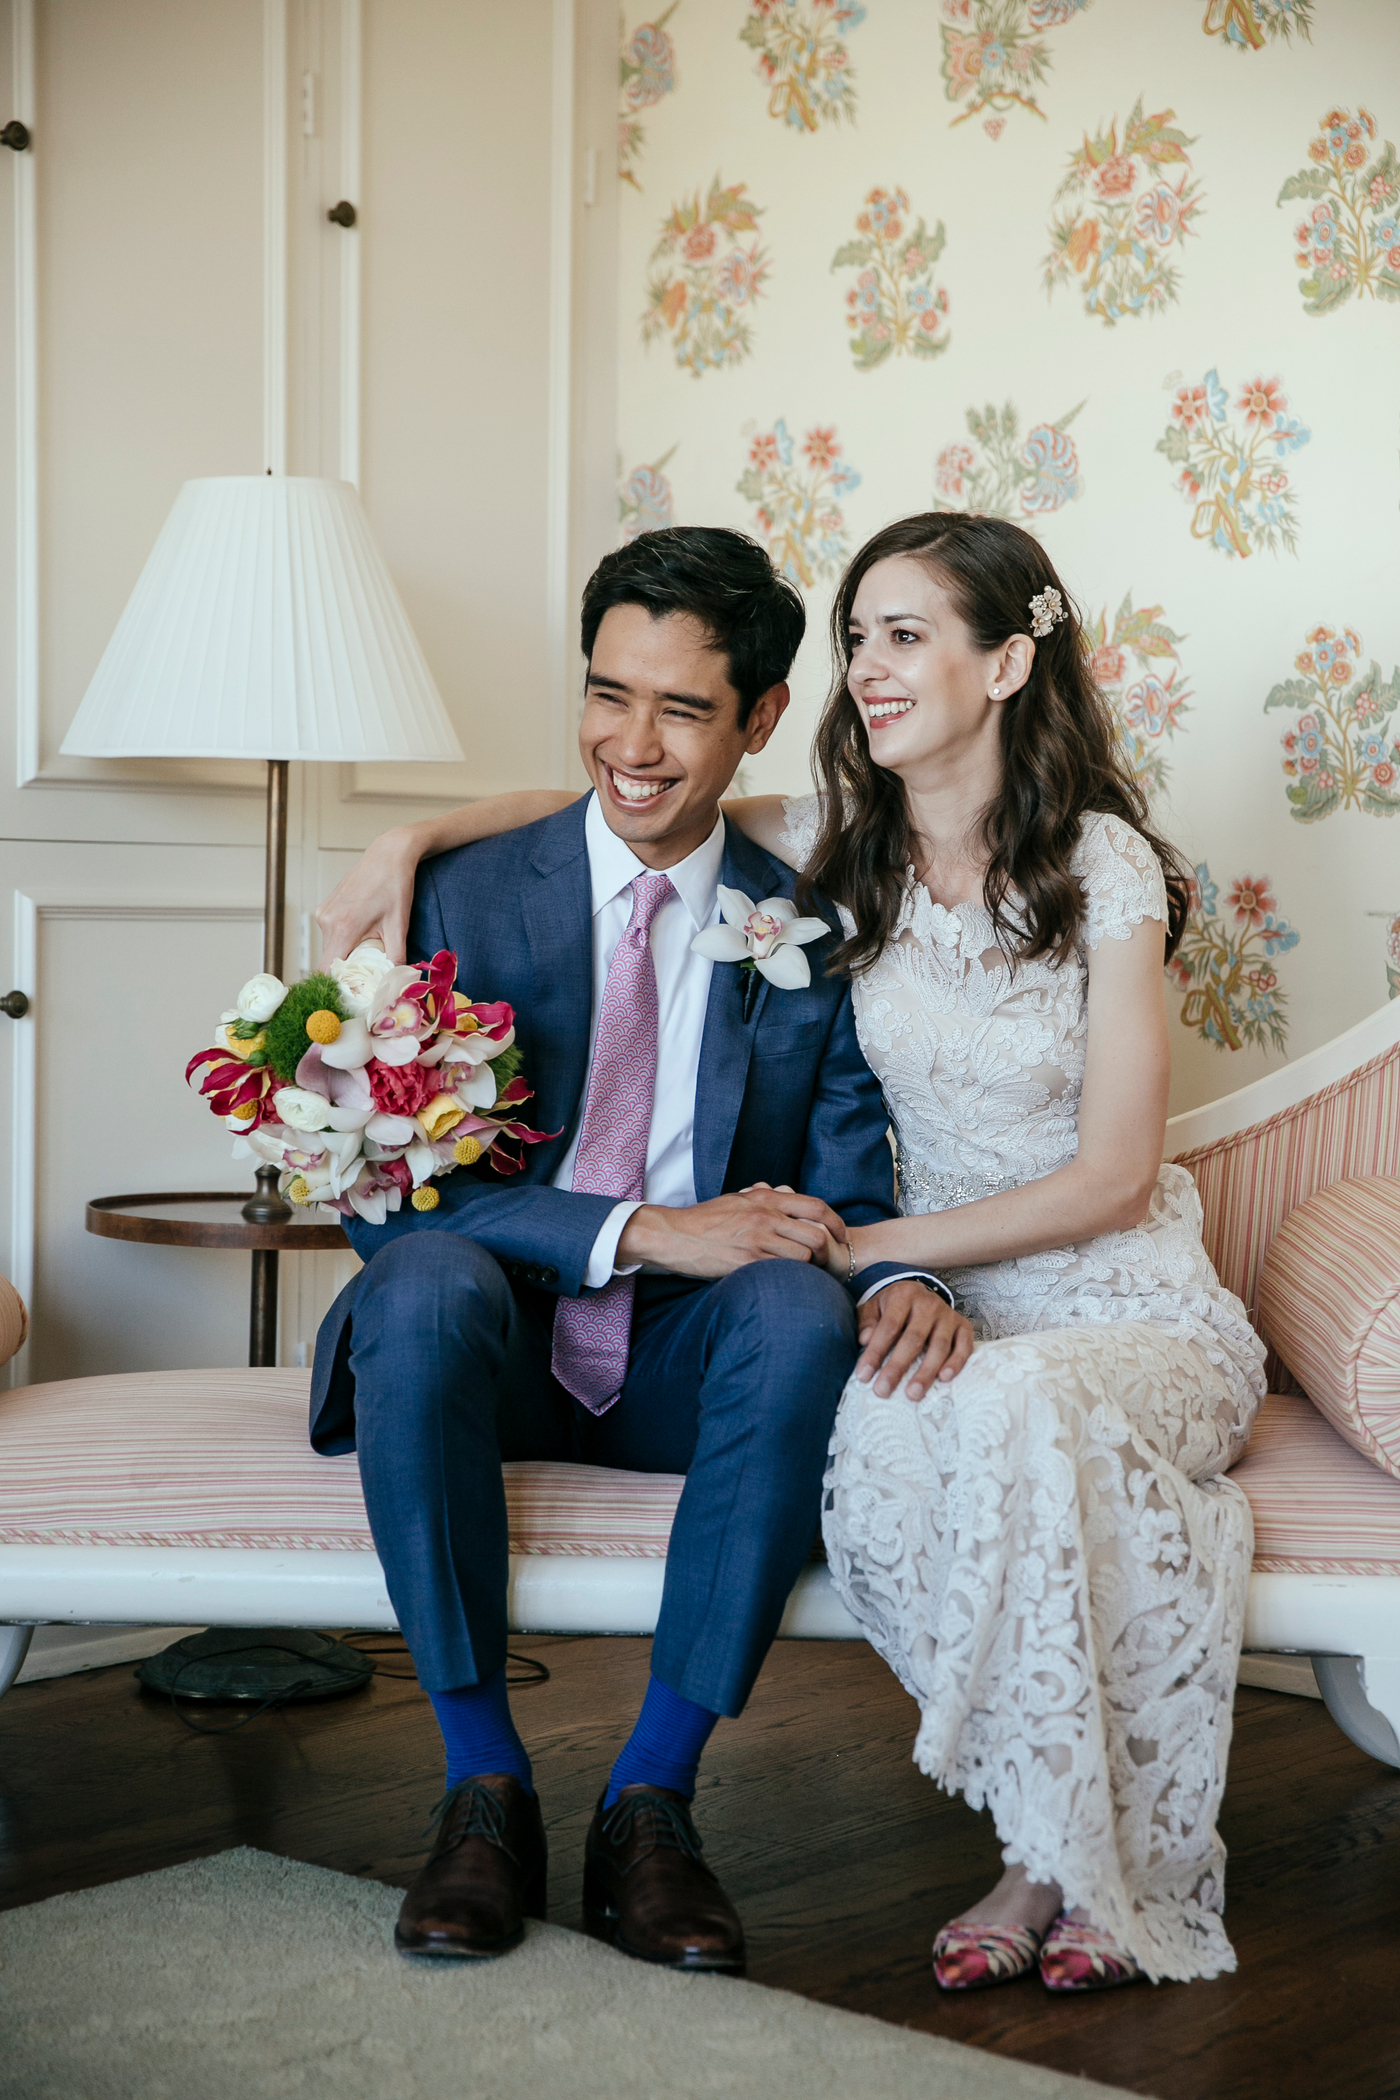 0034_KEVIN_&_MARY_WEDDING_DARLINGTON_HOUSE_LEAF_PHOTOGRAPHY_2016_IMG_1886.JPG